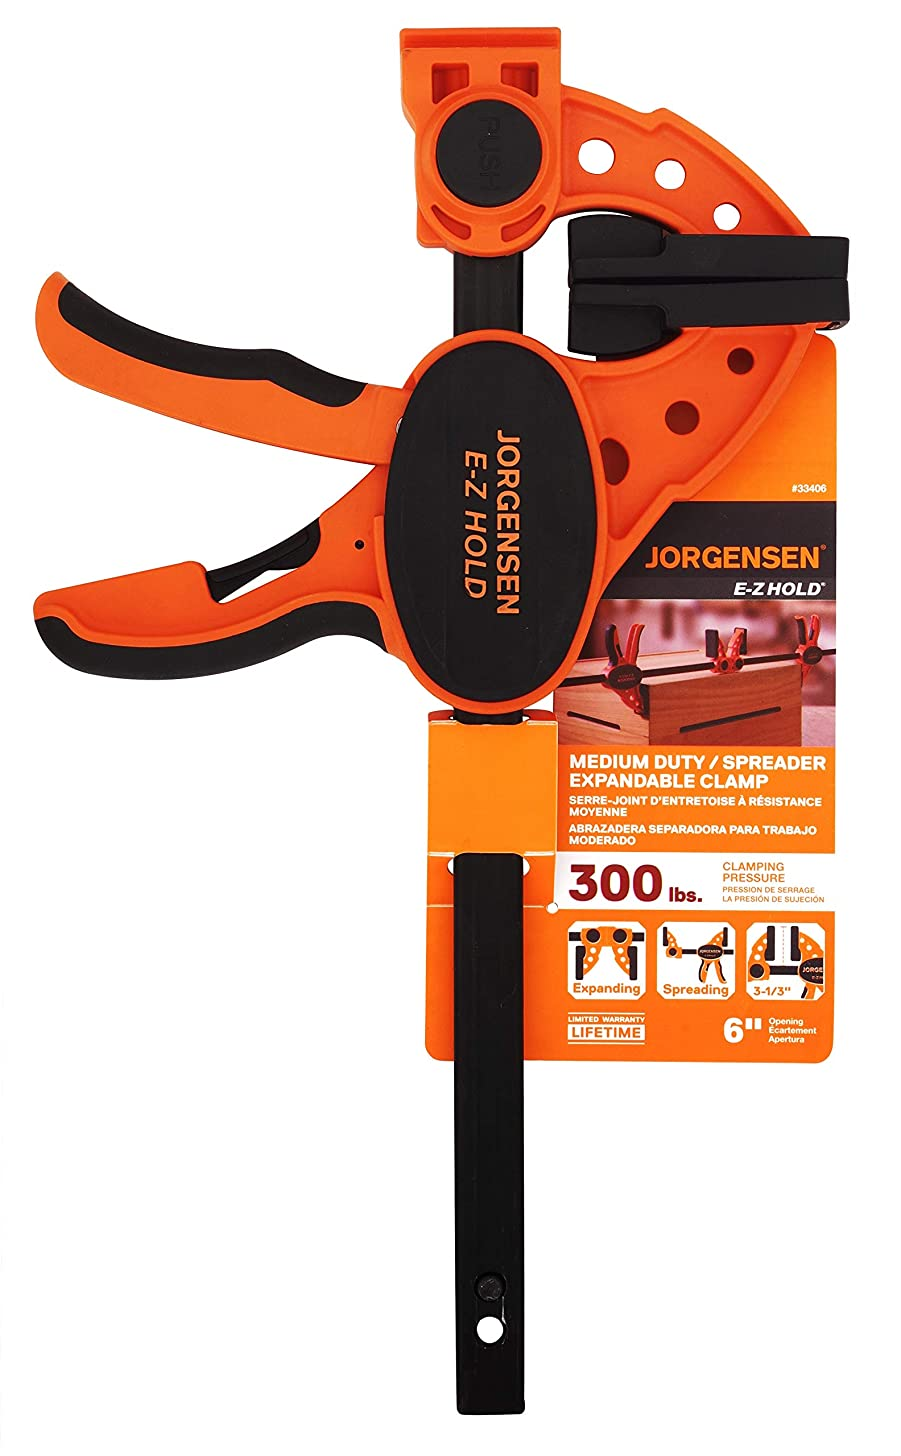 Jorgensen 33406 ISD-3 6-Inch One-Handed Clamp